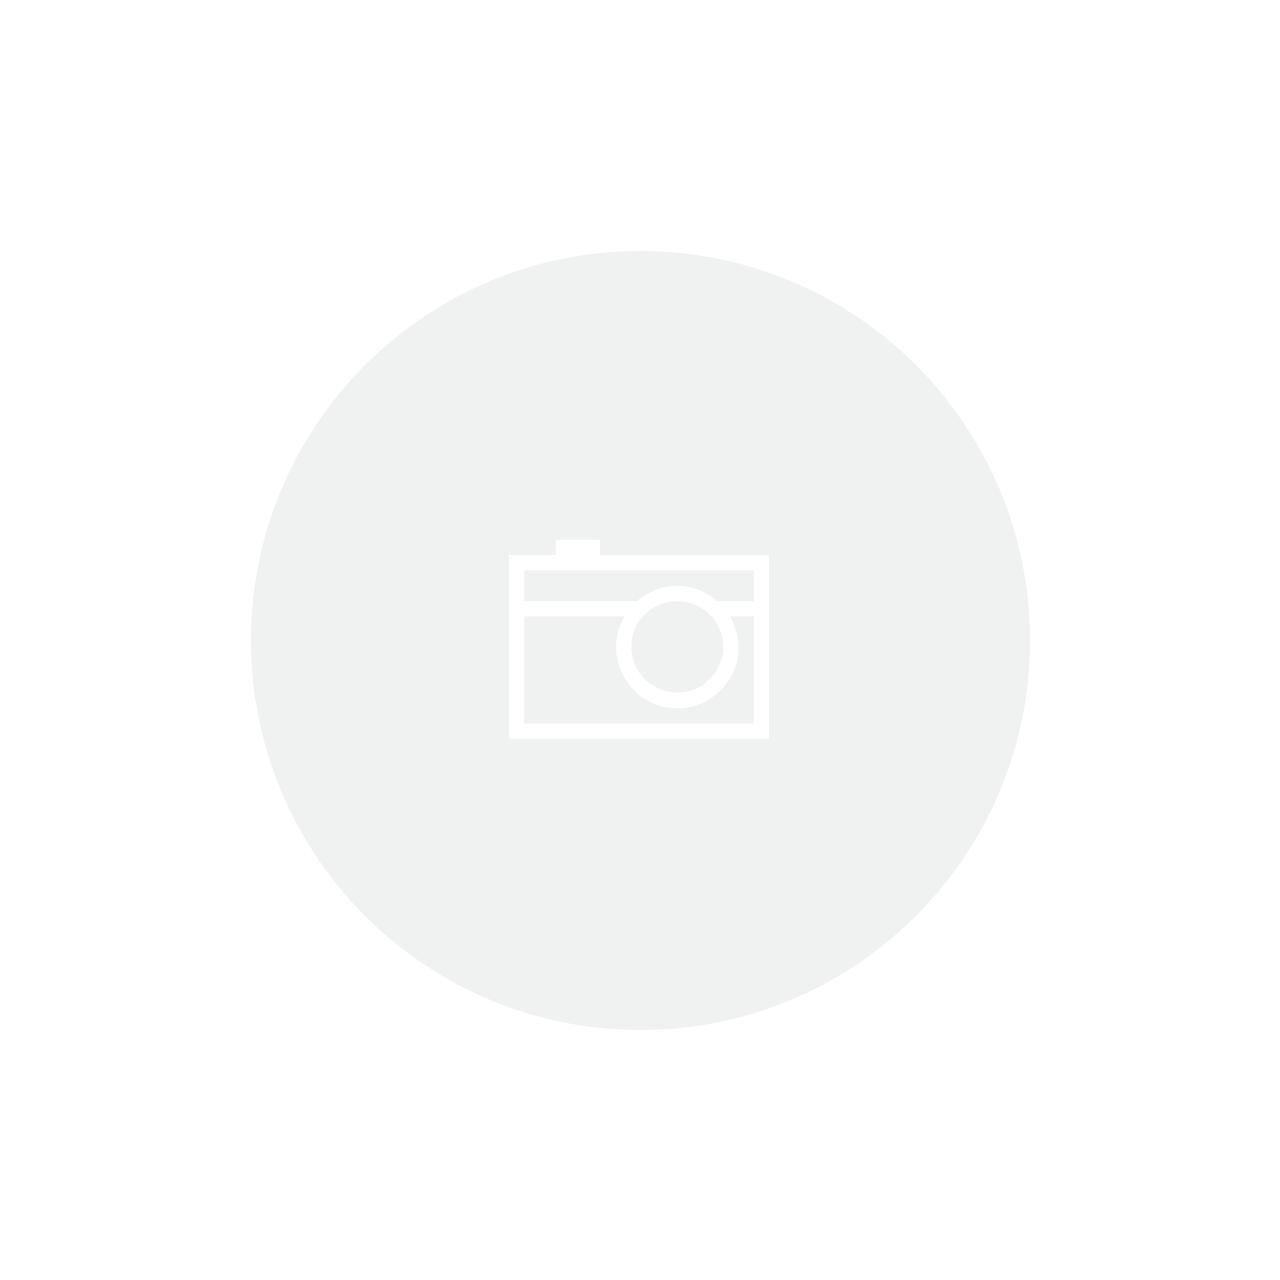 Boleador Branco 2,9 cm Utilita Tramontina